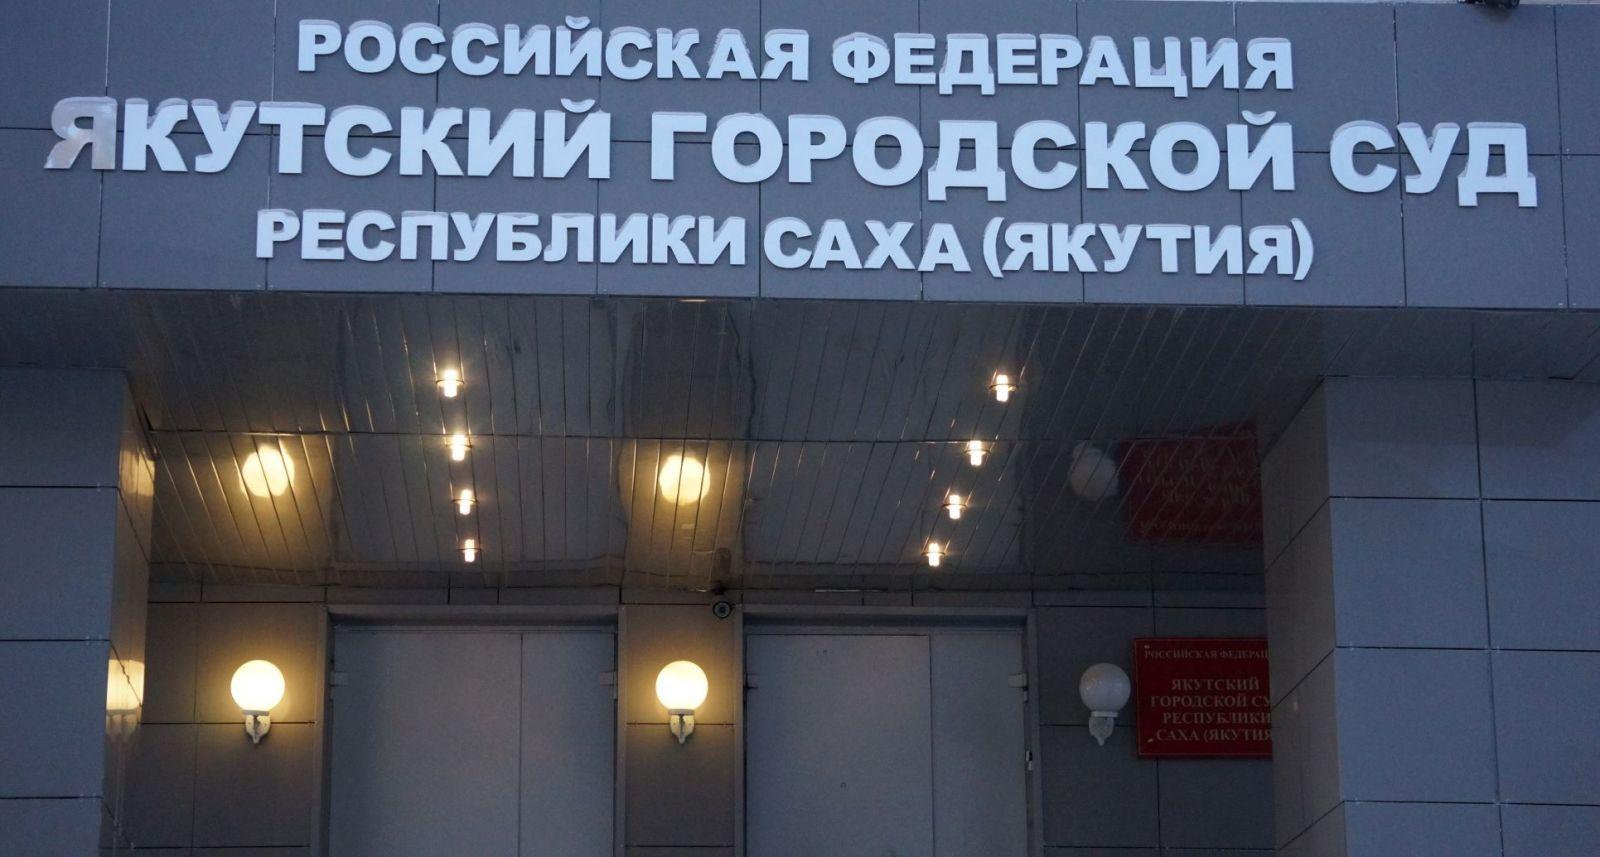 45 жителей Якутска судят за нарушение масочного режима